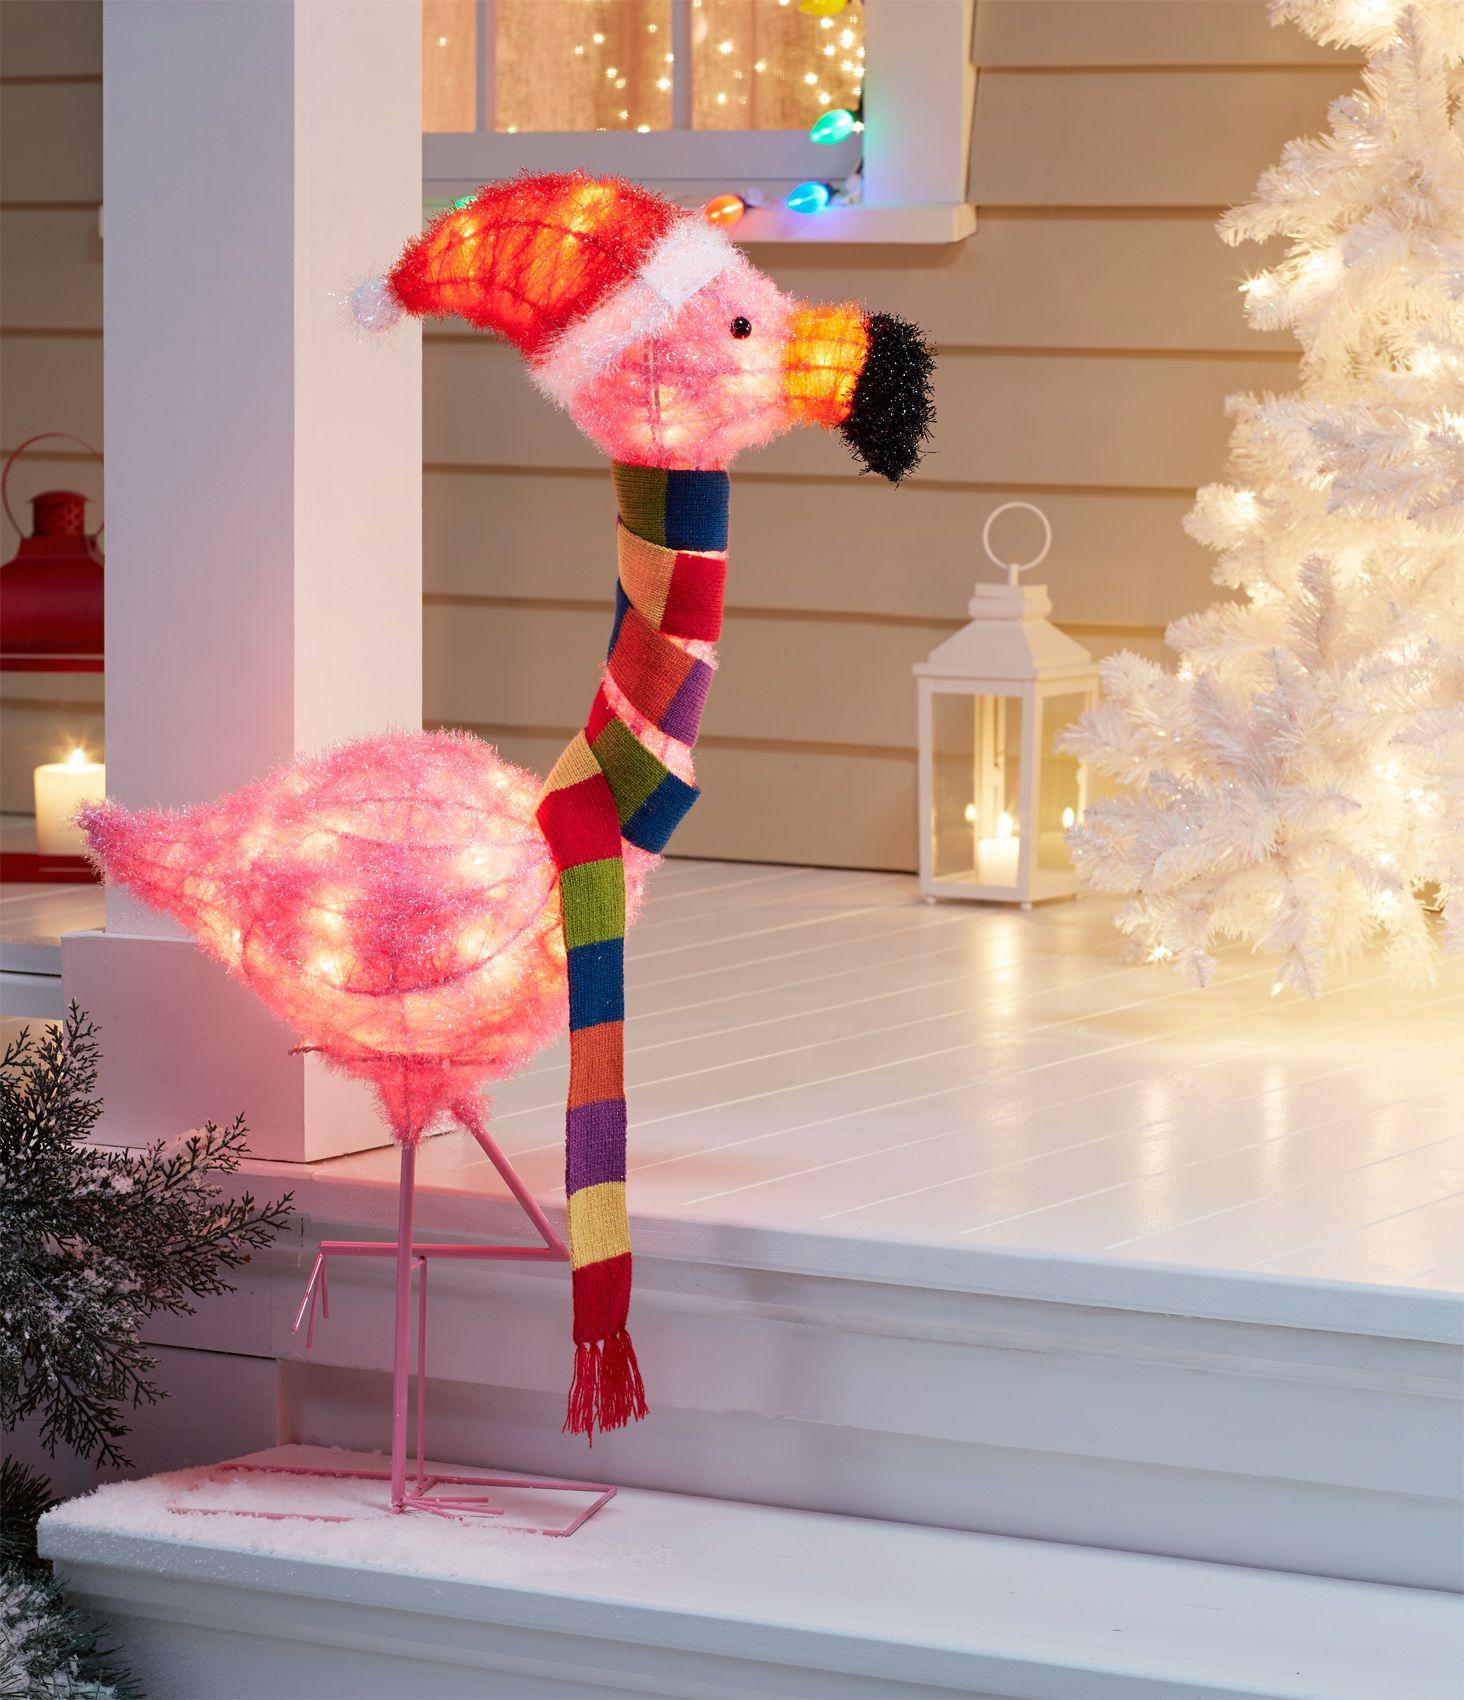 Holiday-Flamingo_2020.jpg